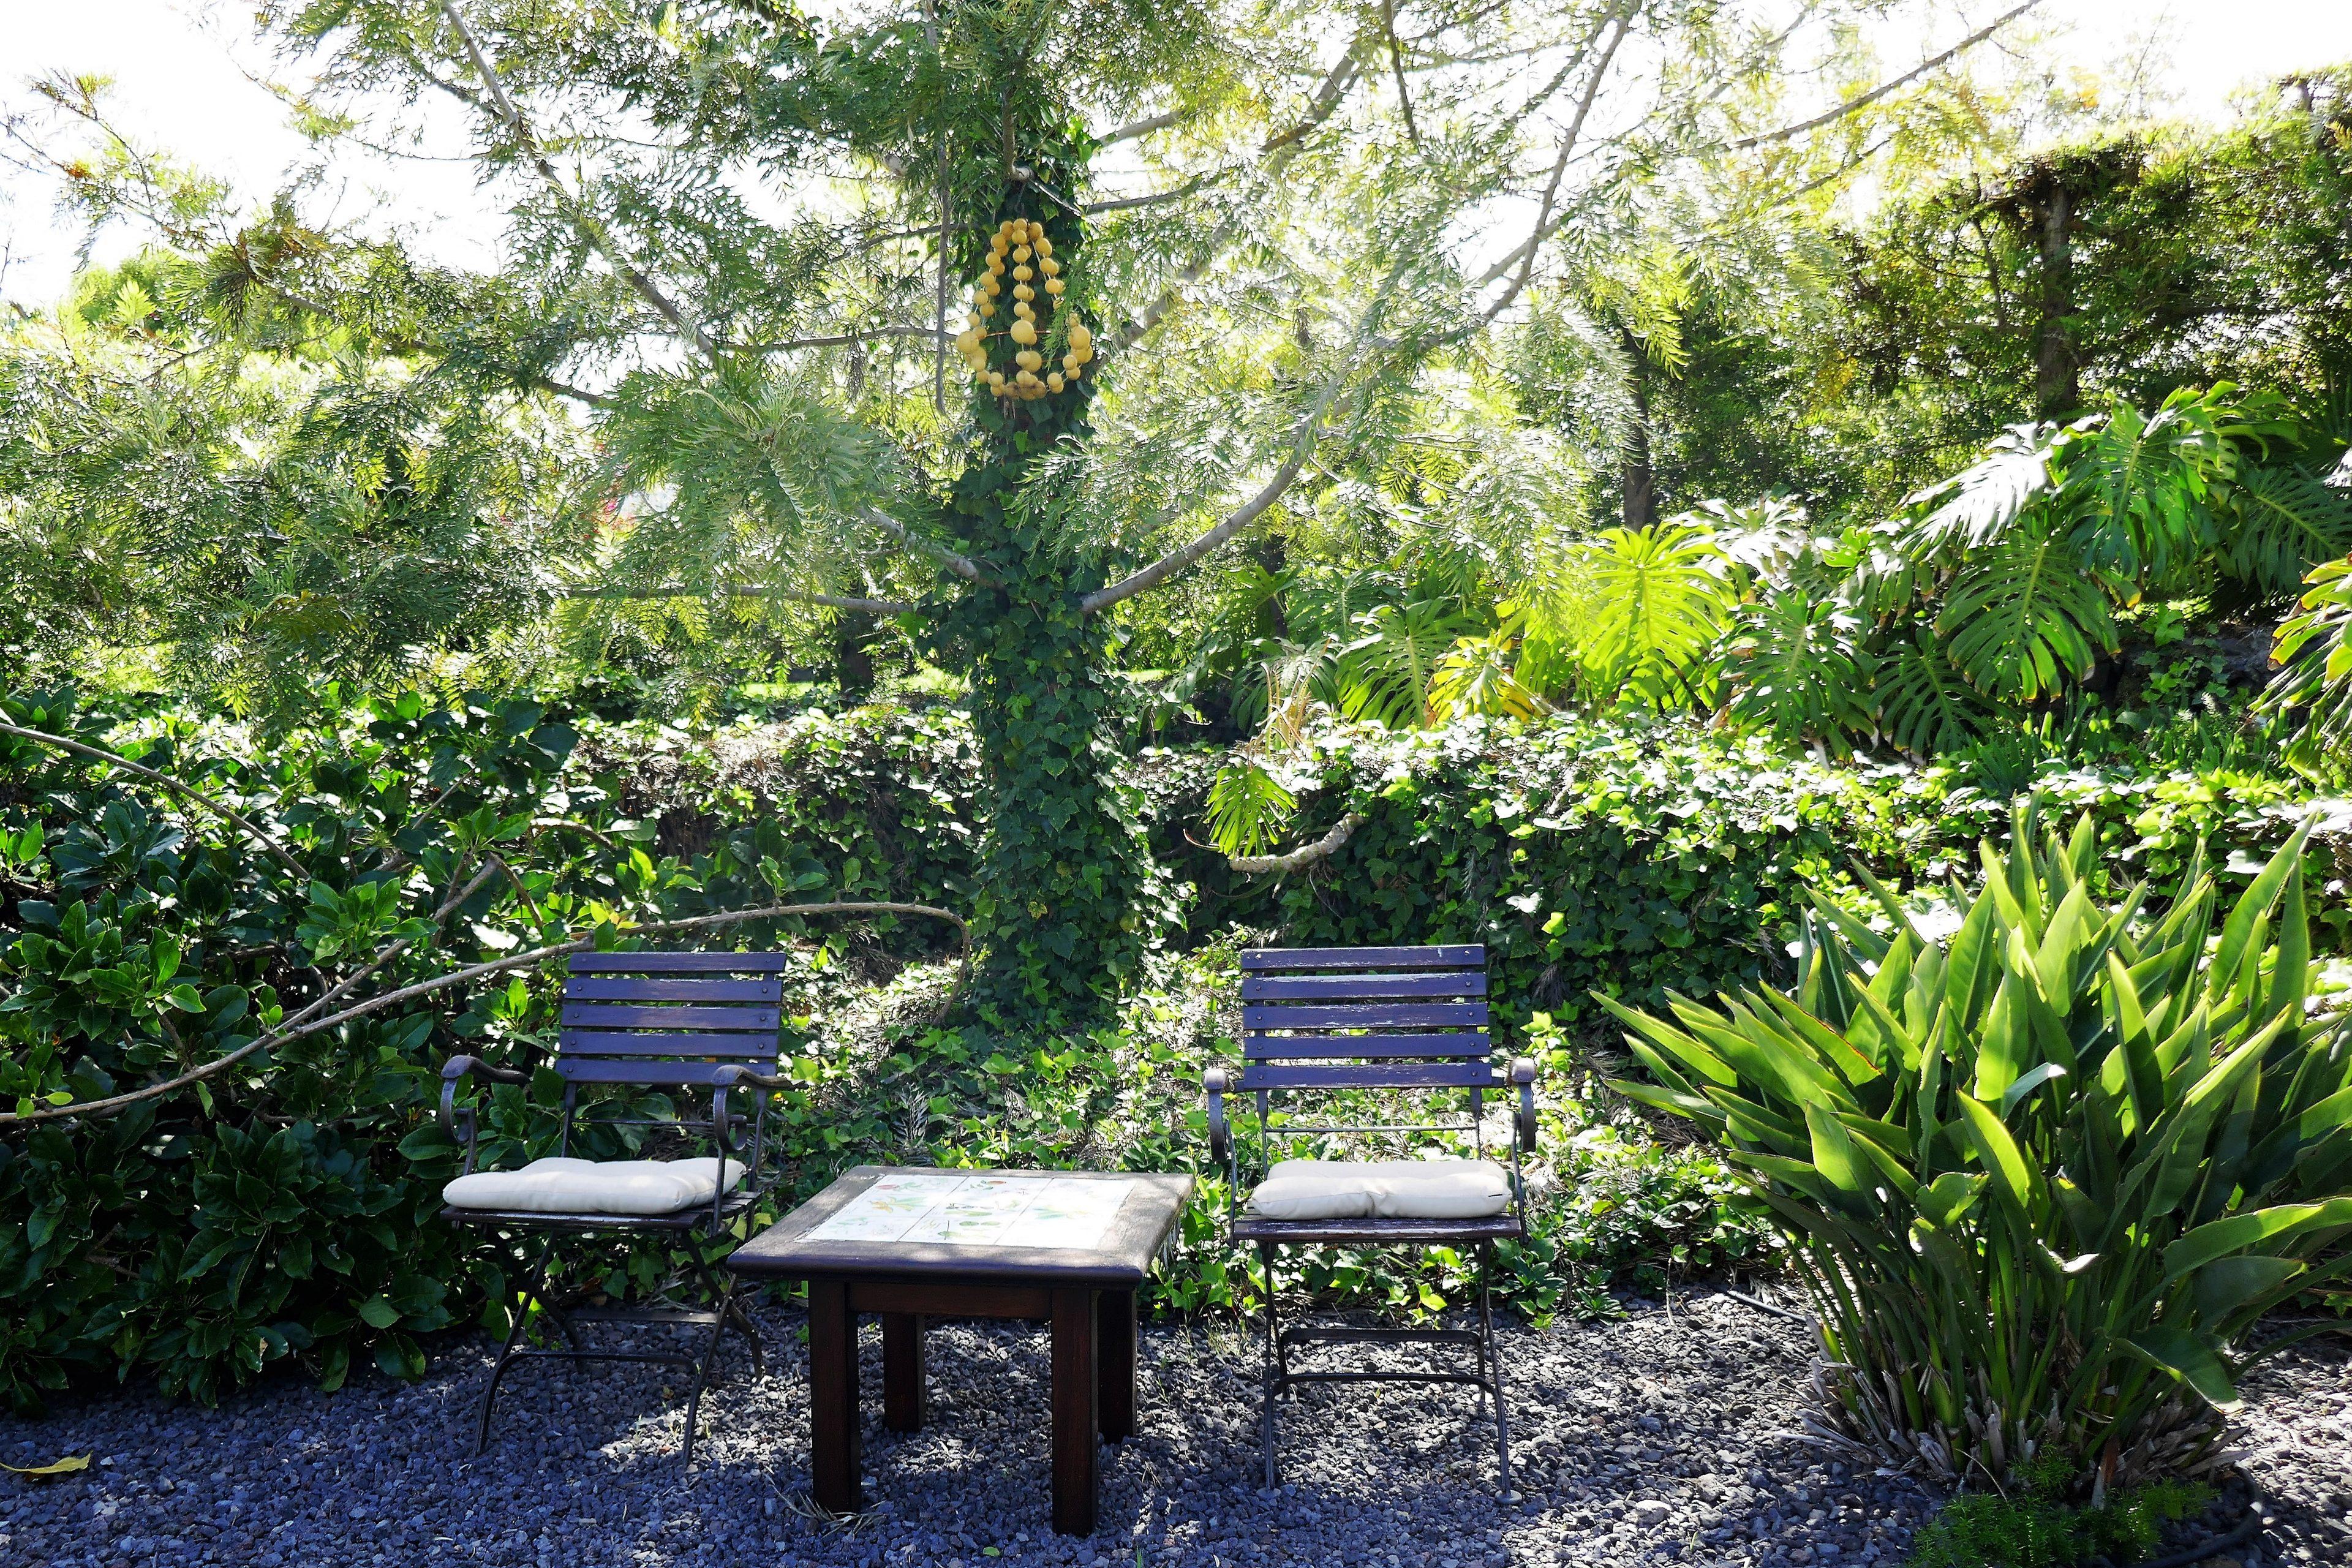 Tuin is een privé park